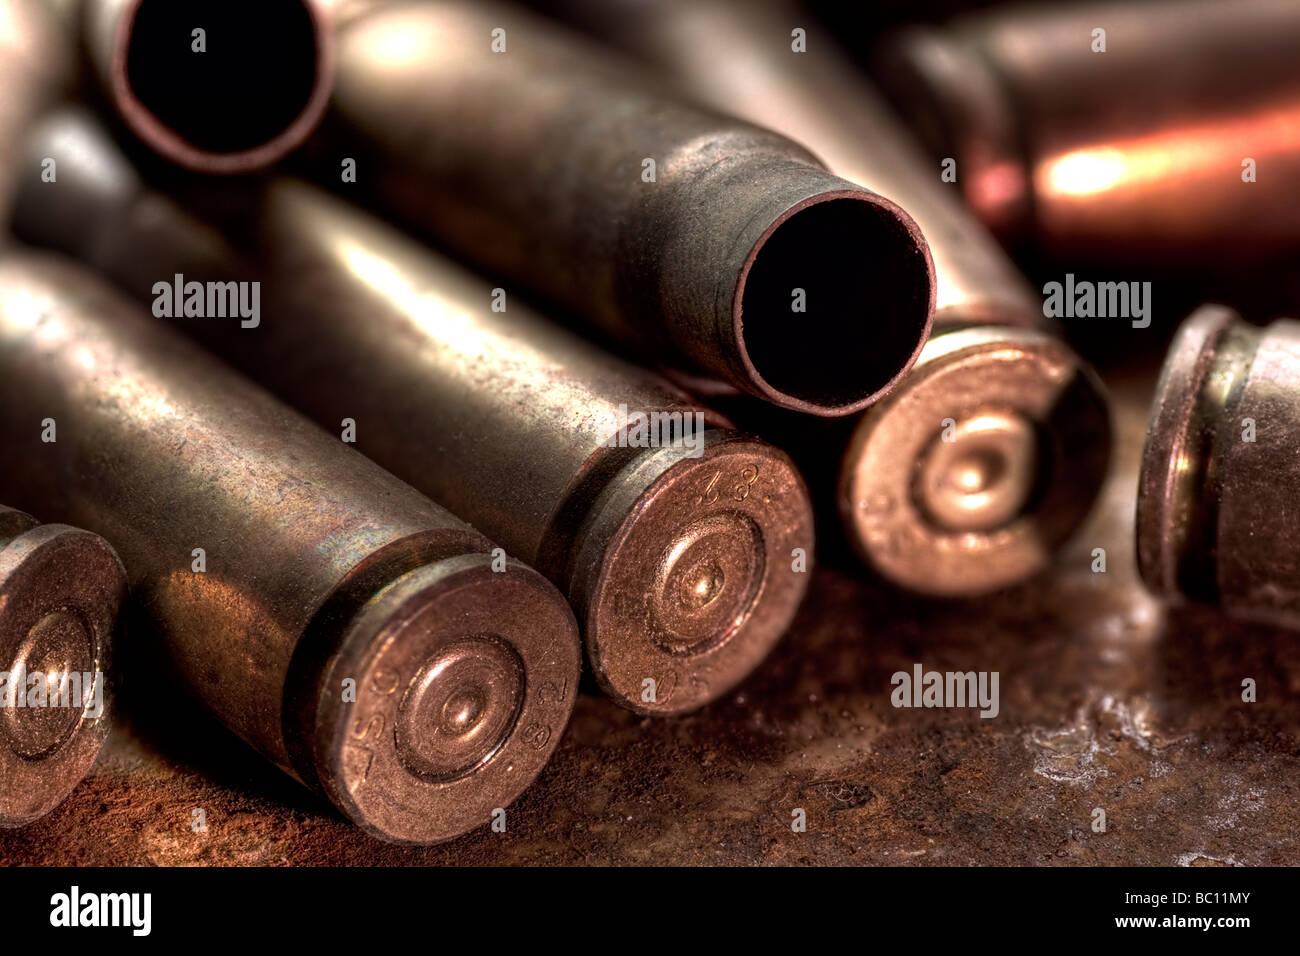 Empty AK-47 casings - Stock Image